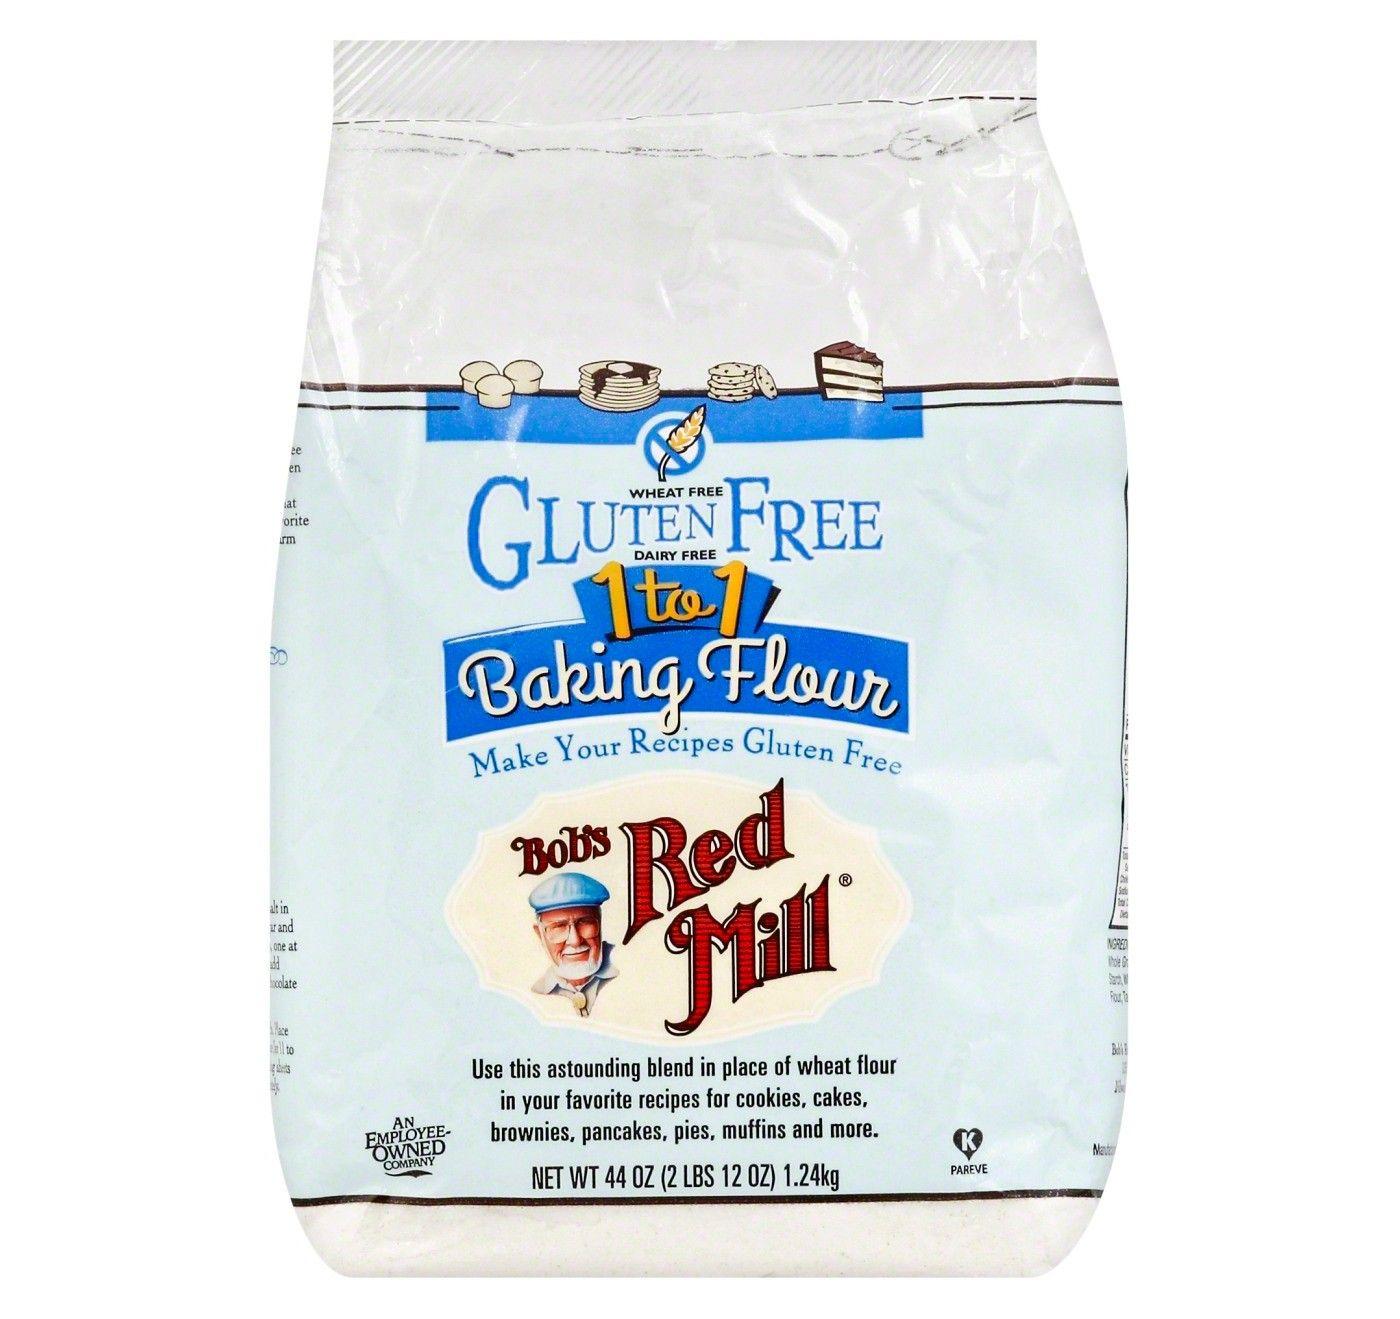 Bobs red mill gluten free all purpose baking flour 44oz